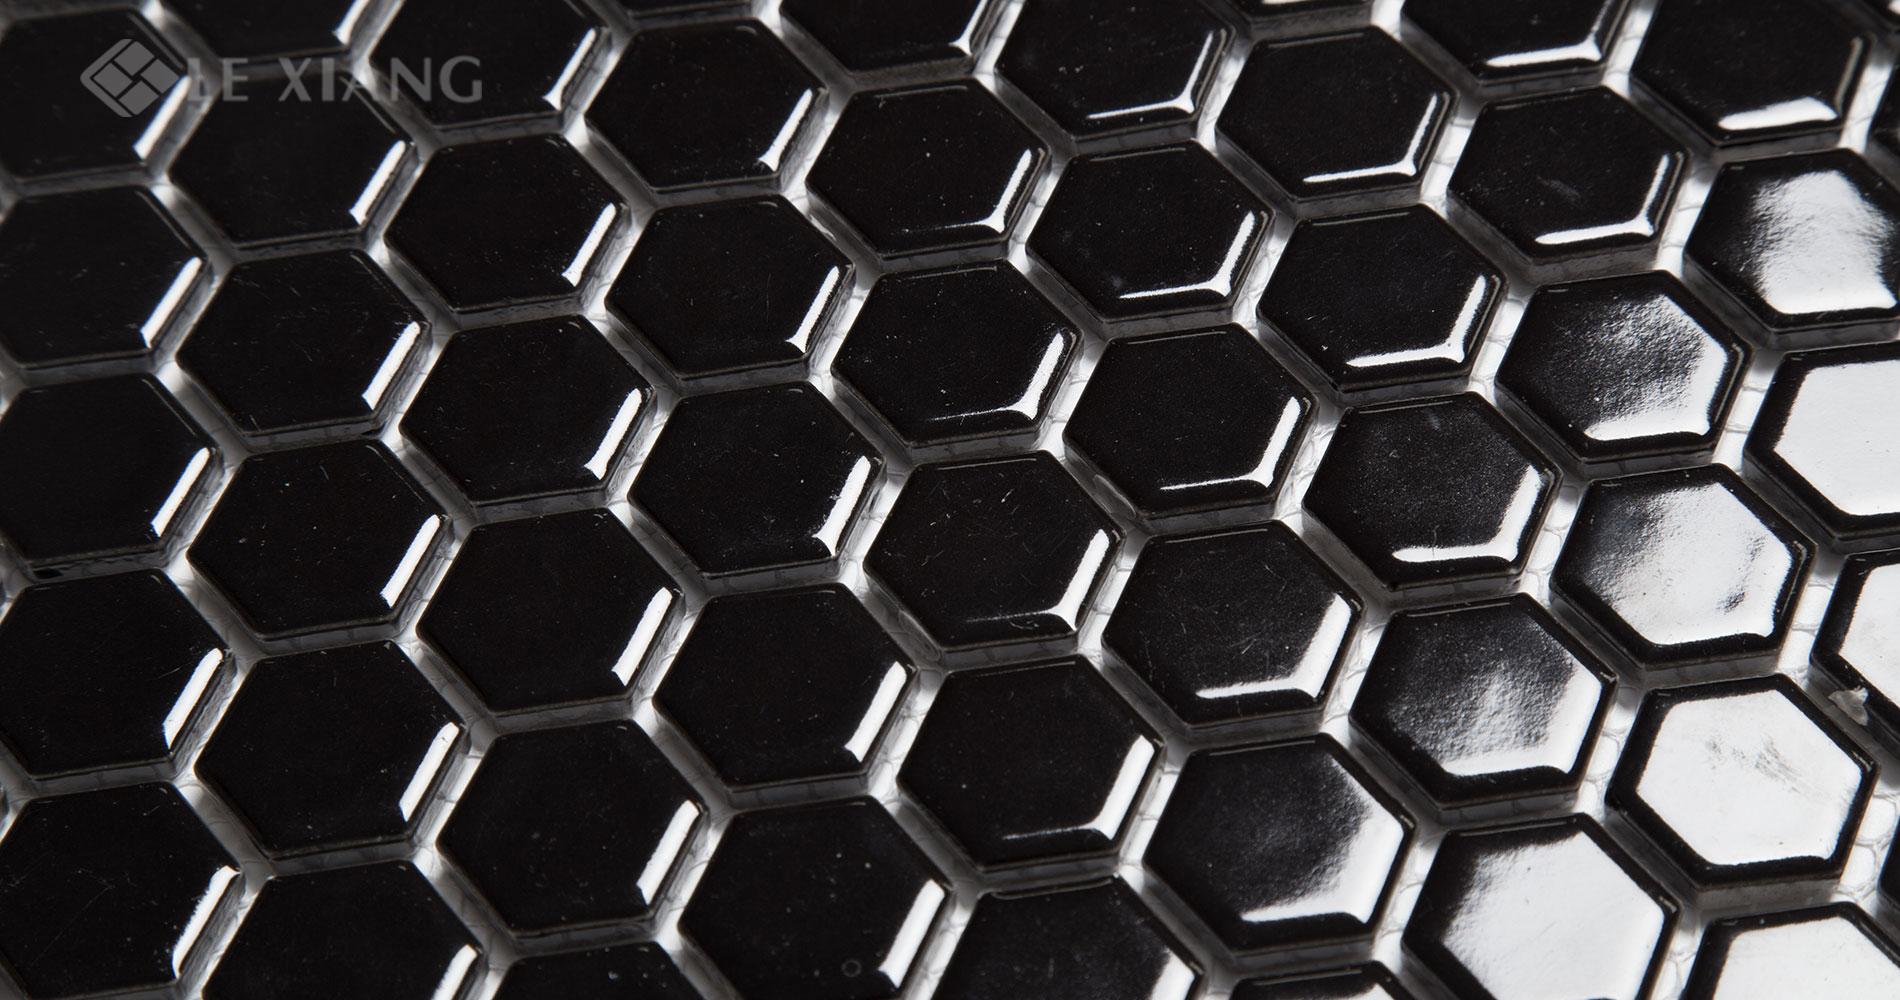 Porcelain-Hexagon-Mosaic-Tile-For-Bathroom-Wall-Flooring-Tiles-7